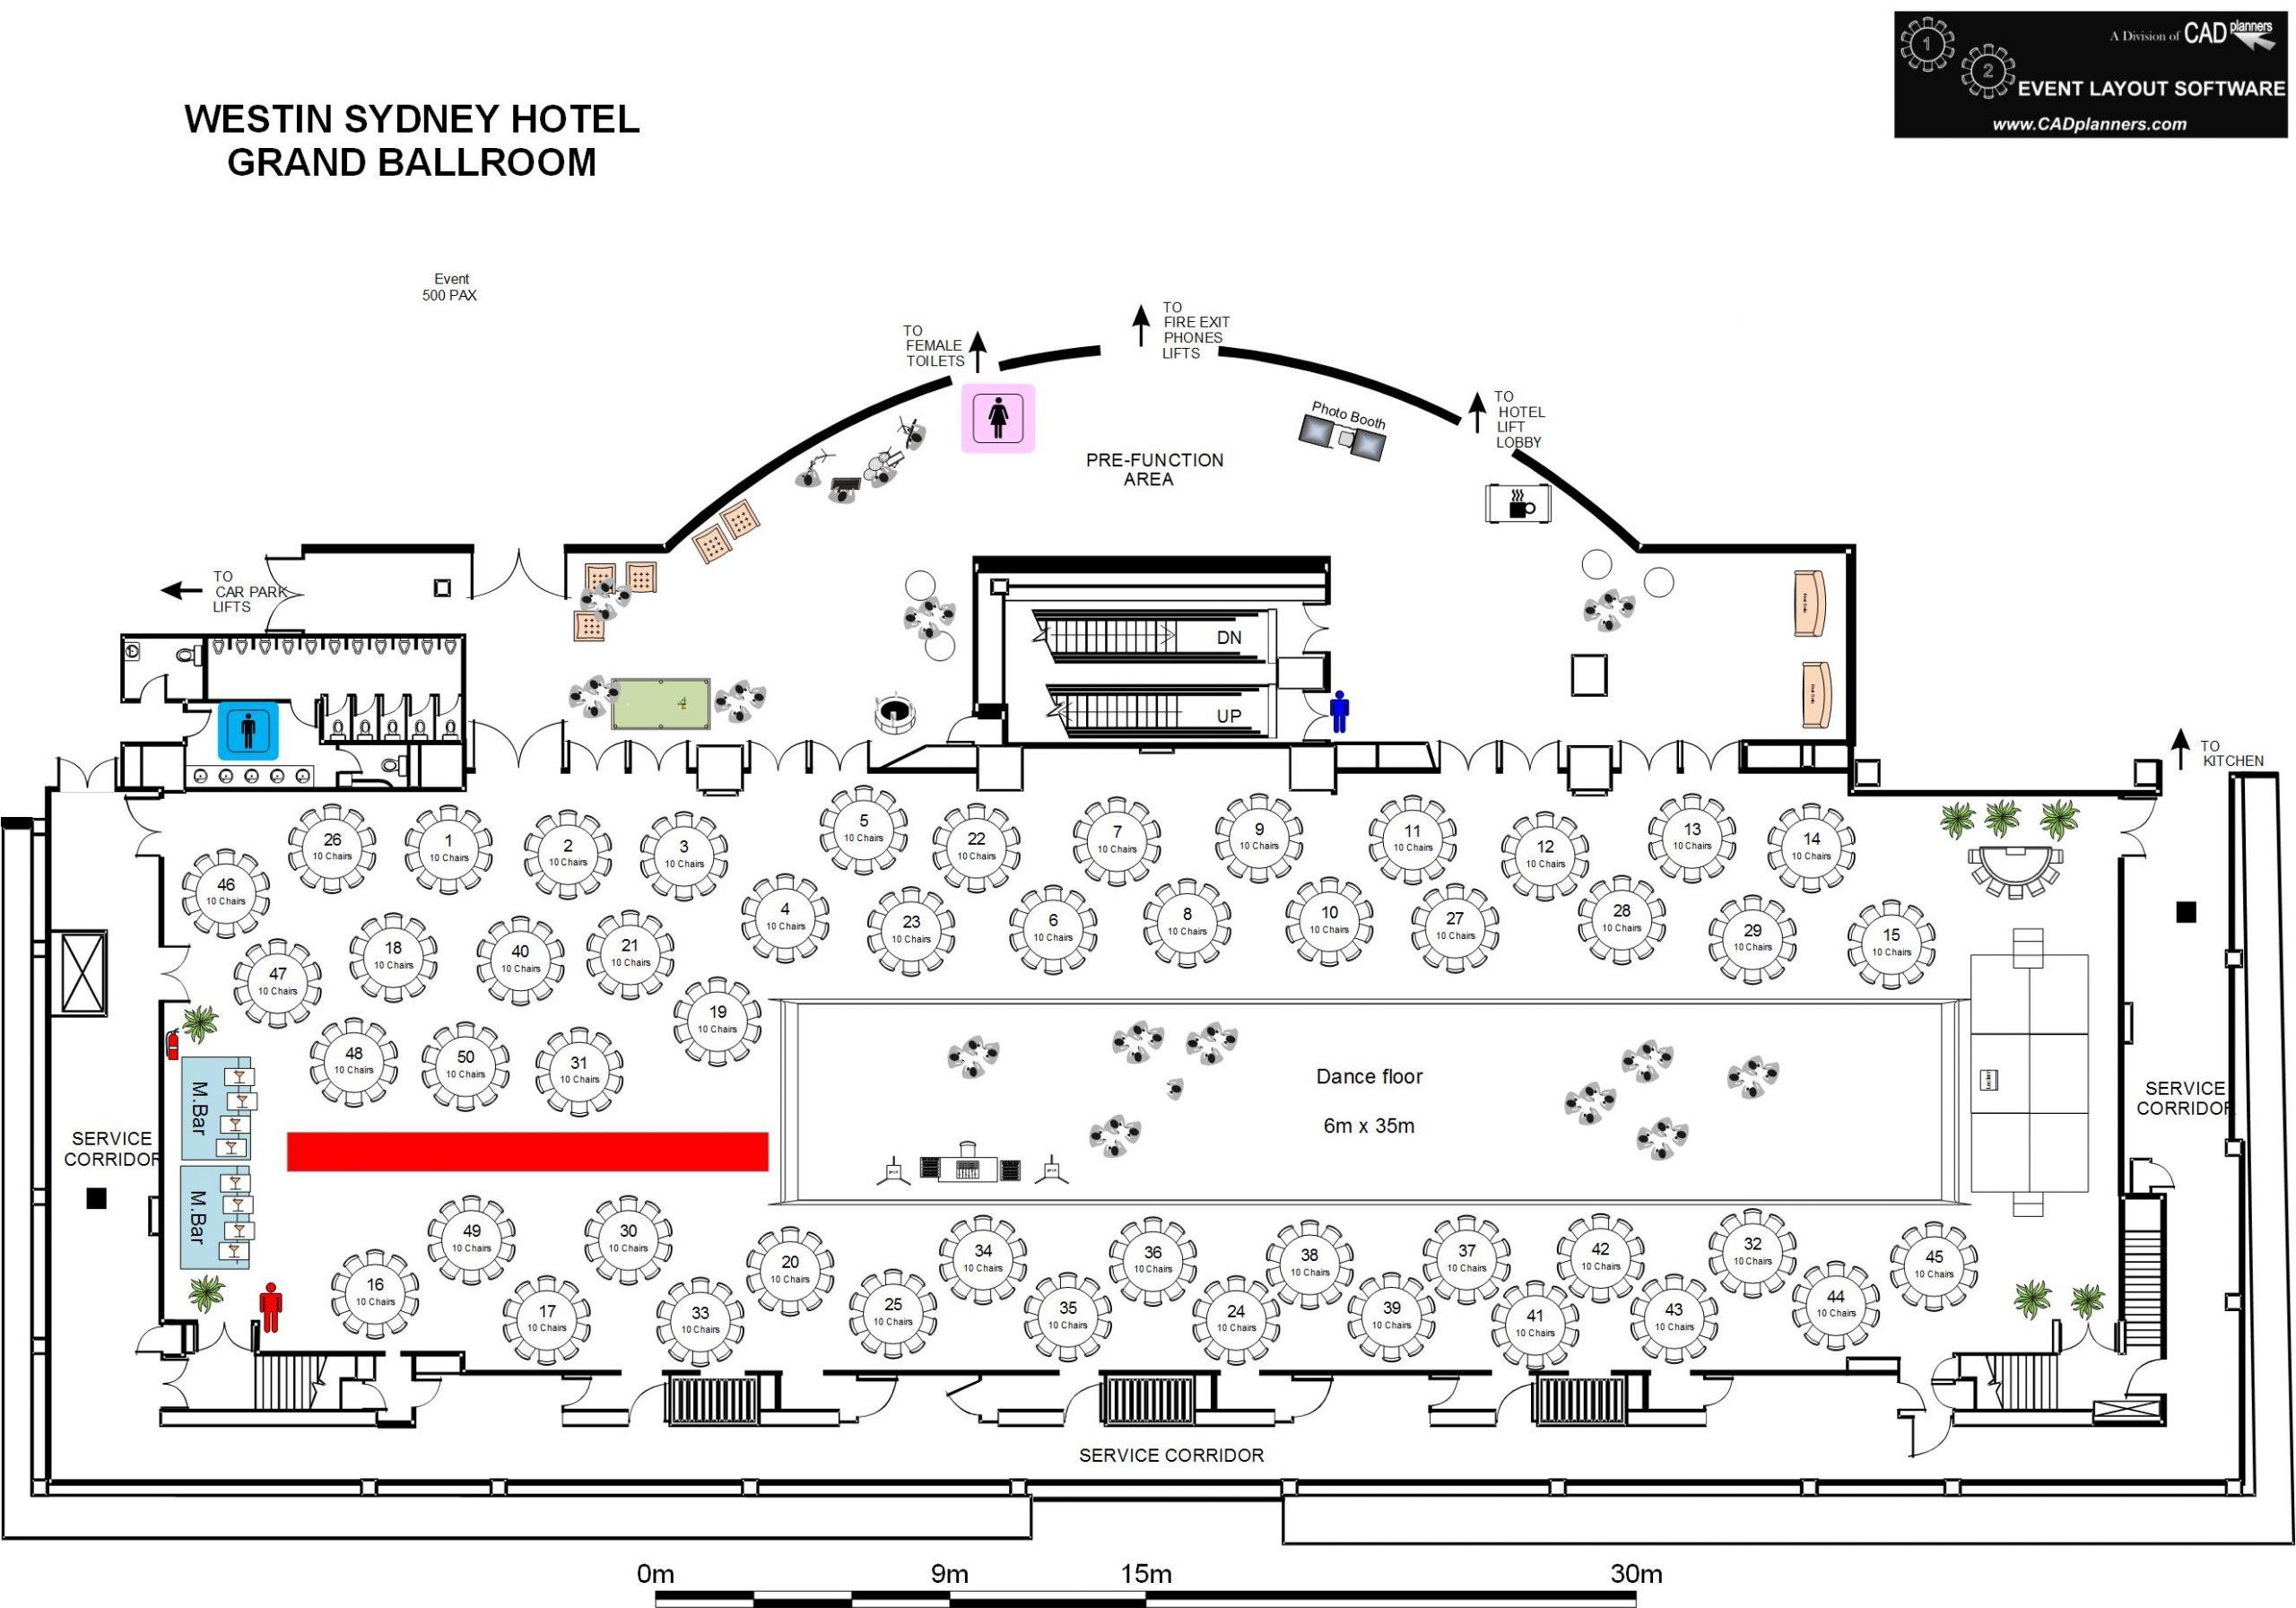 IHG Event Plan